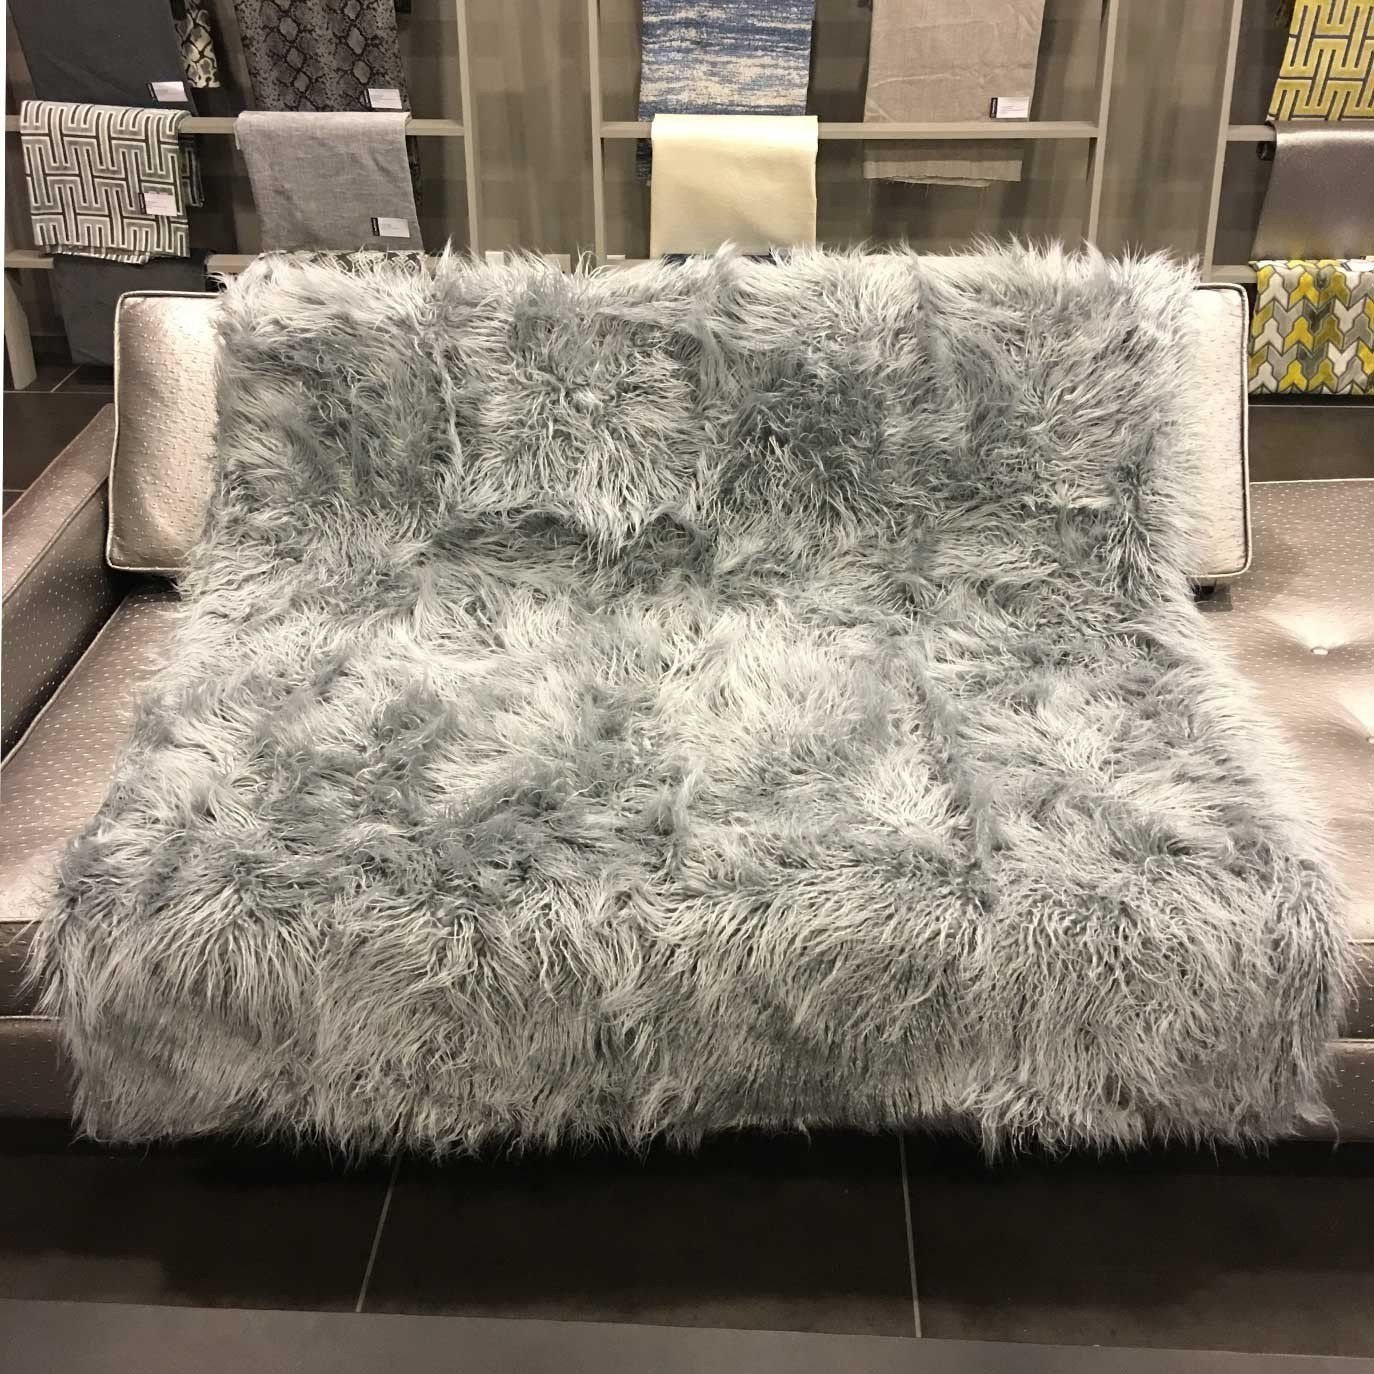 Luxurious Shaggy Faux Fur Throw Blanket